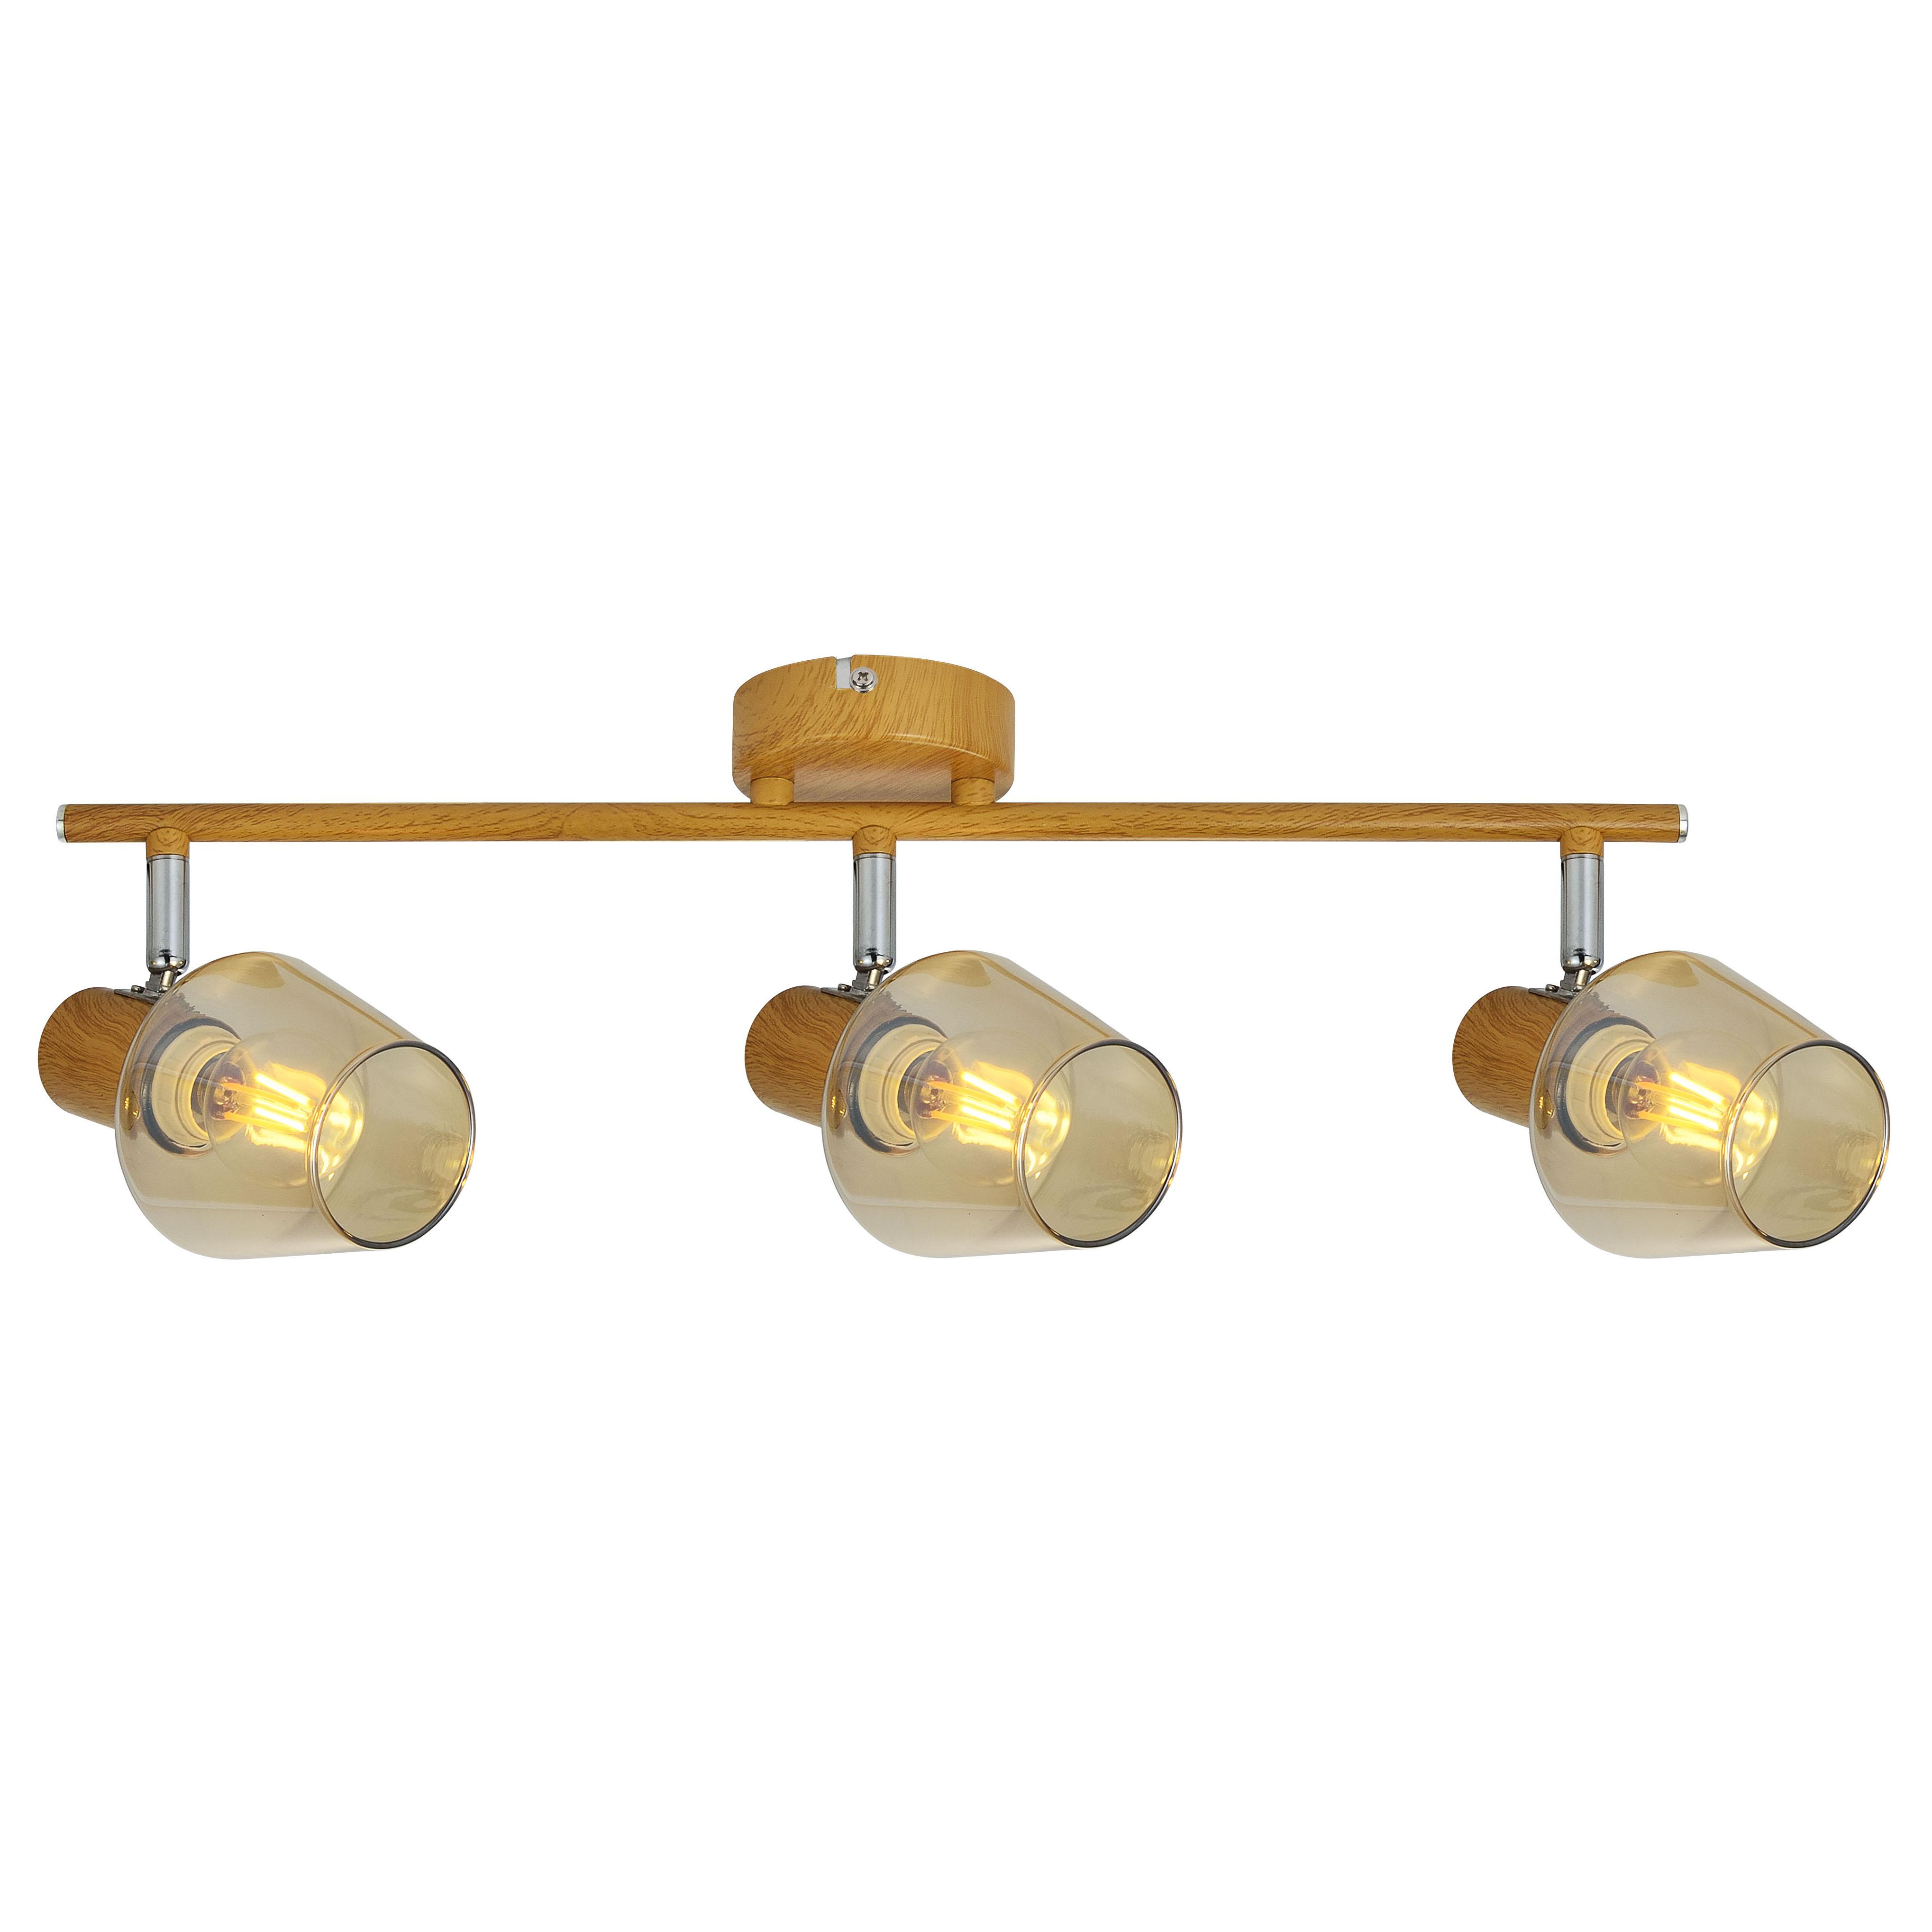 Plafonnier en métal marron